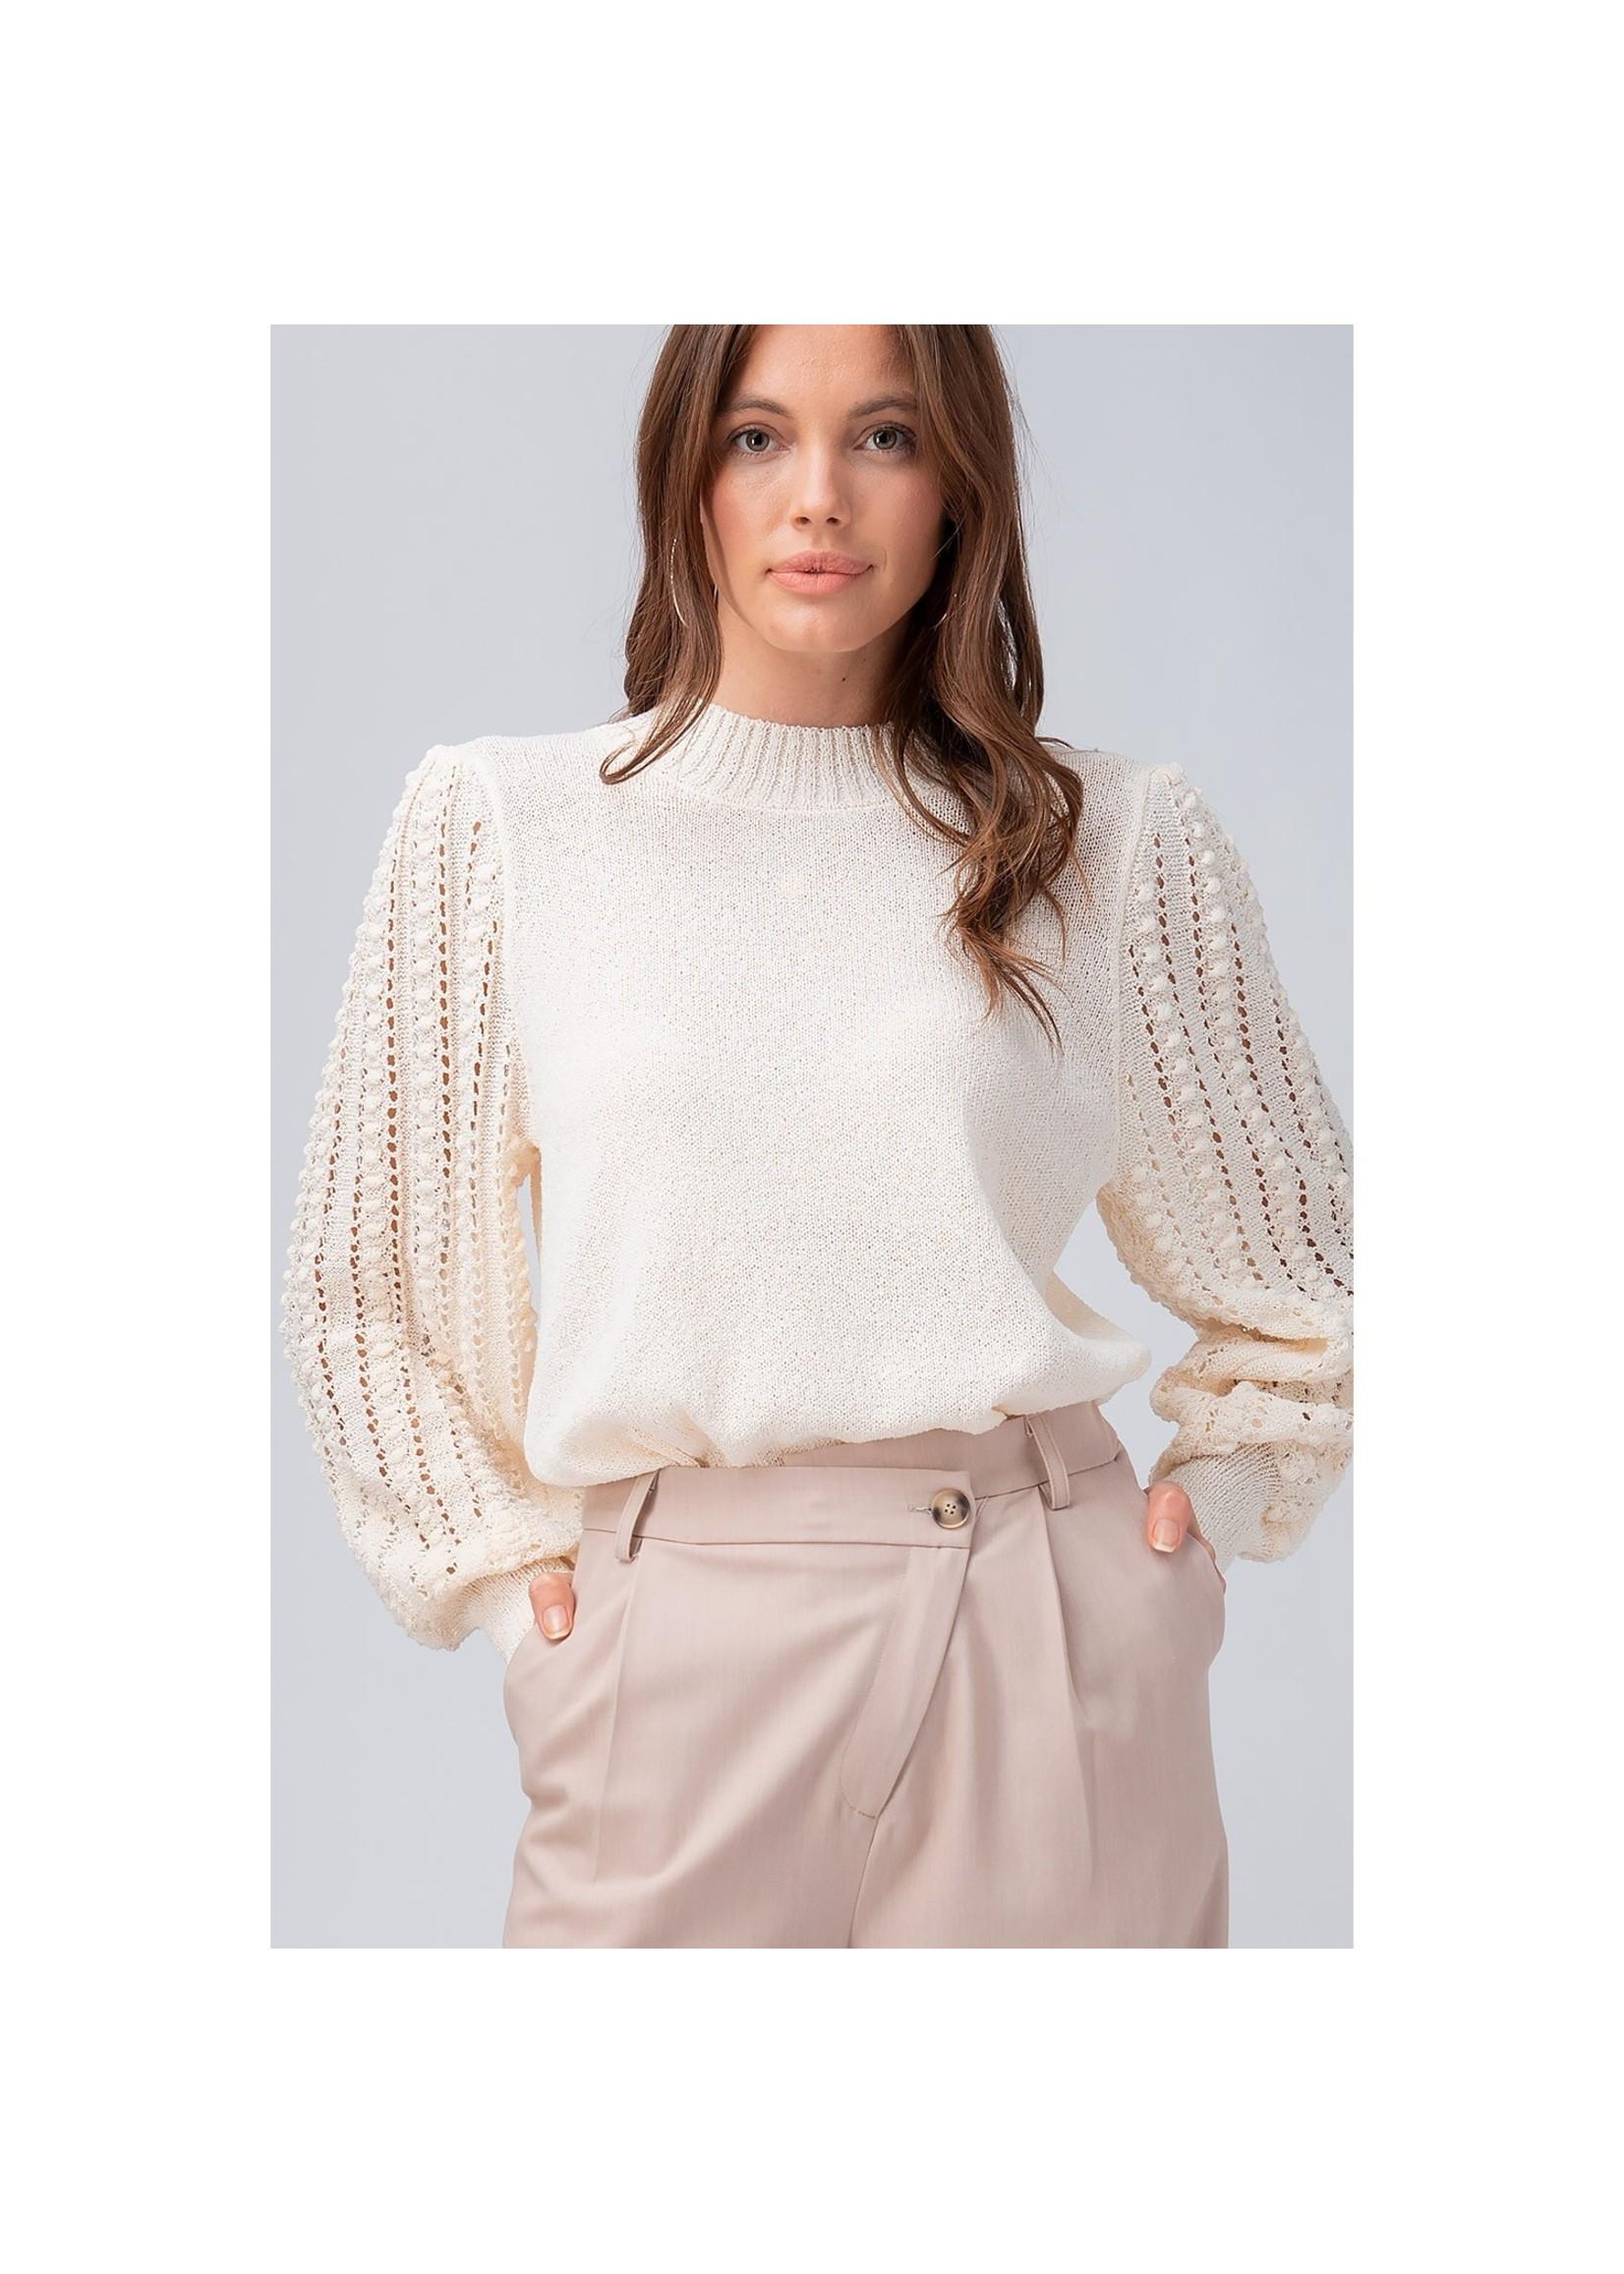 Urban Daizy Cream Puff Sleeve Knit Top